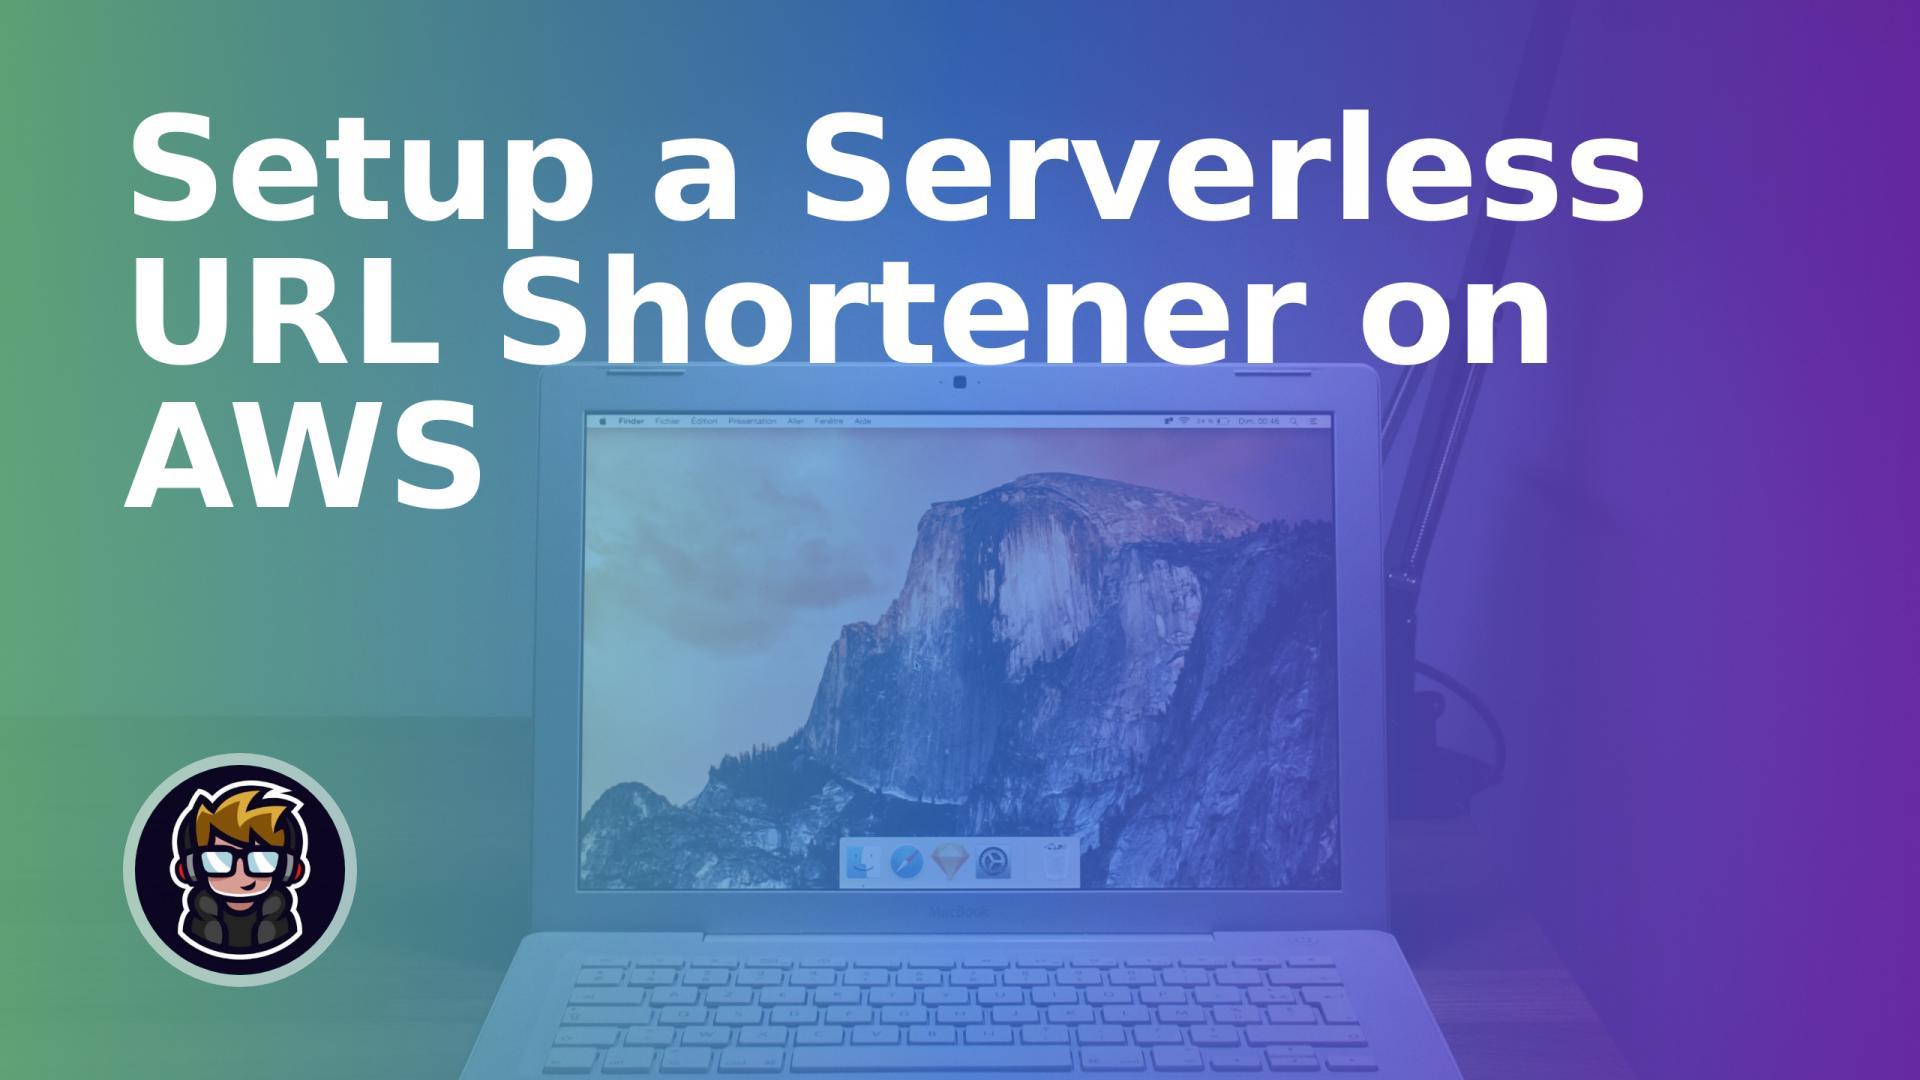 Setup a Serverless URL Shortener on AWS